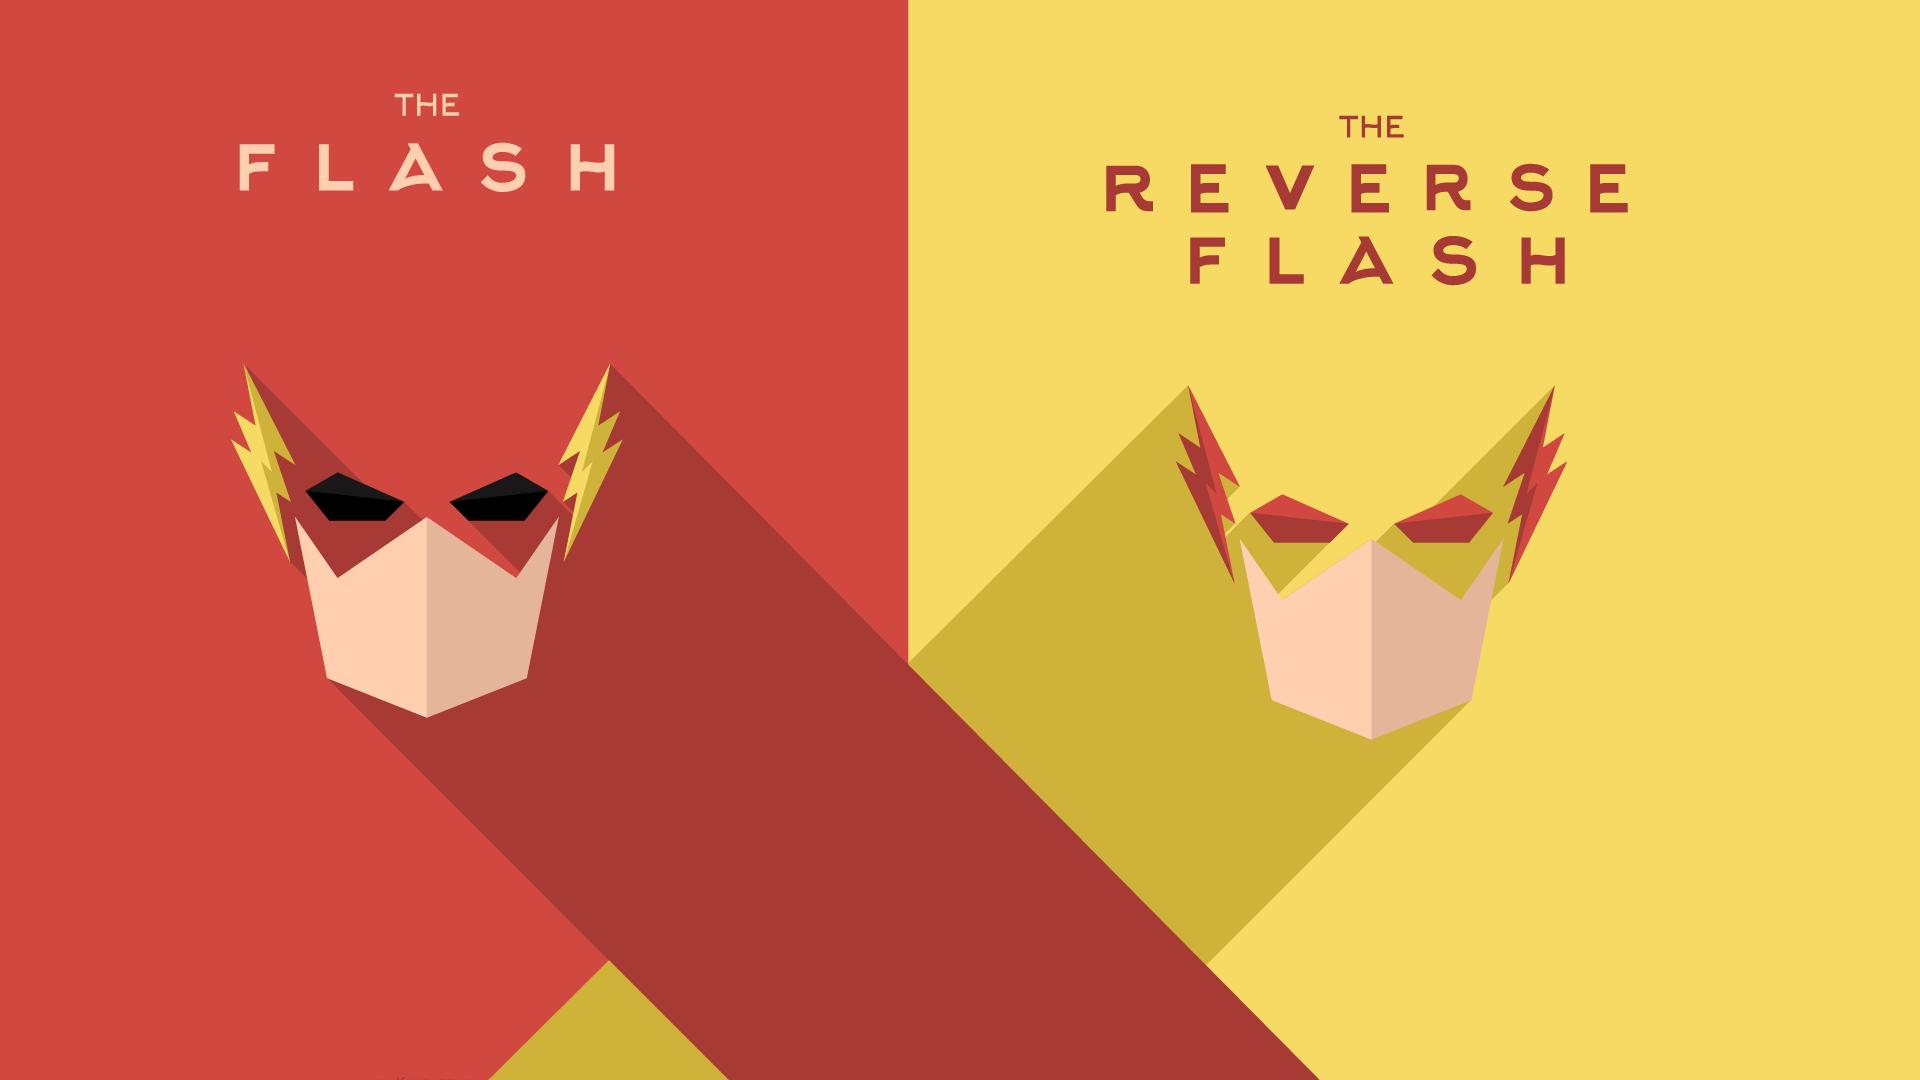 Flash Vs Reverse Flash Wallpaper: Zoom The Flash Wallpapers